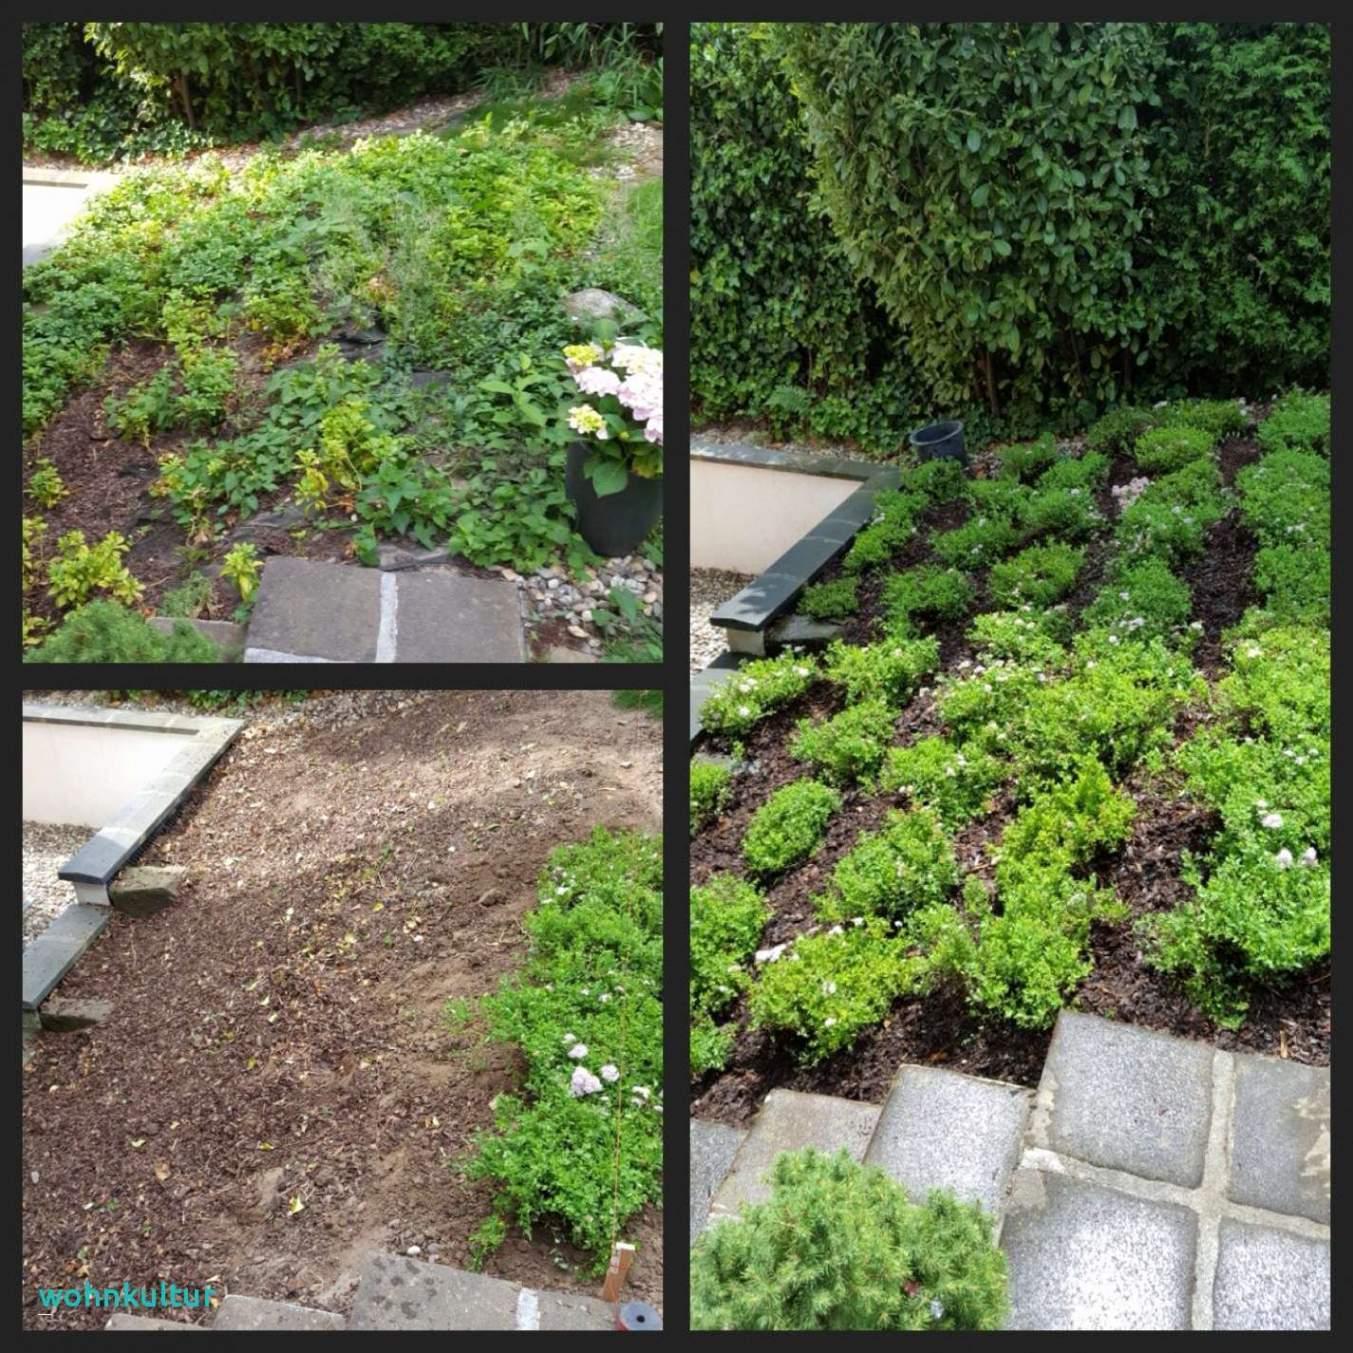 Terrasse Beet Gestalten Best Of 36 Luxus Garten Am Hang Ideen Bilder Inspirierend